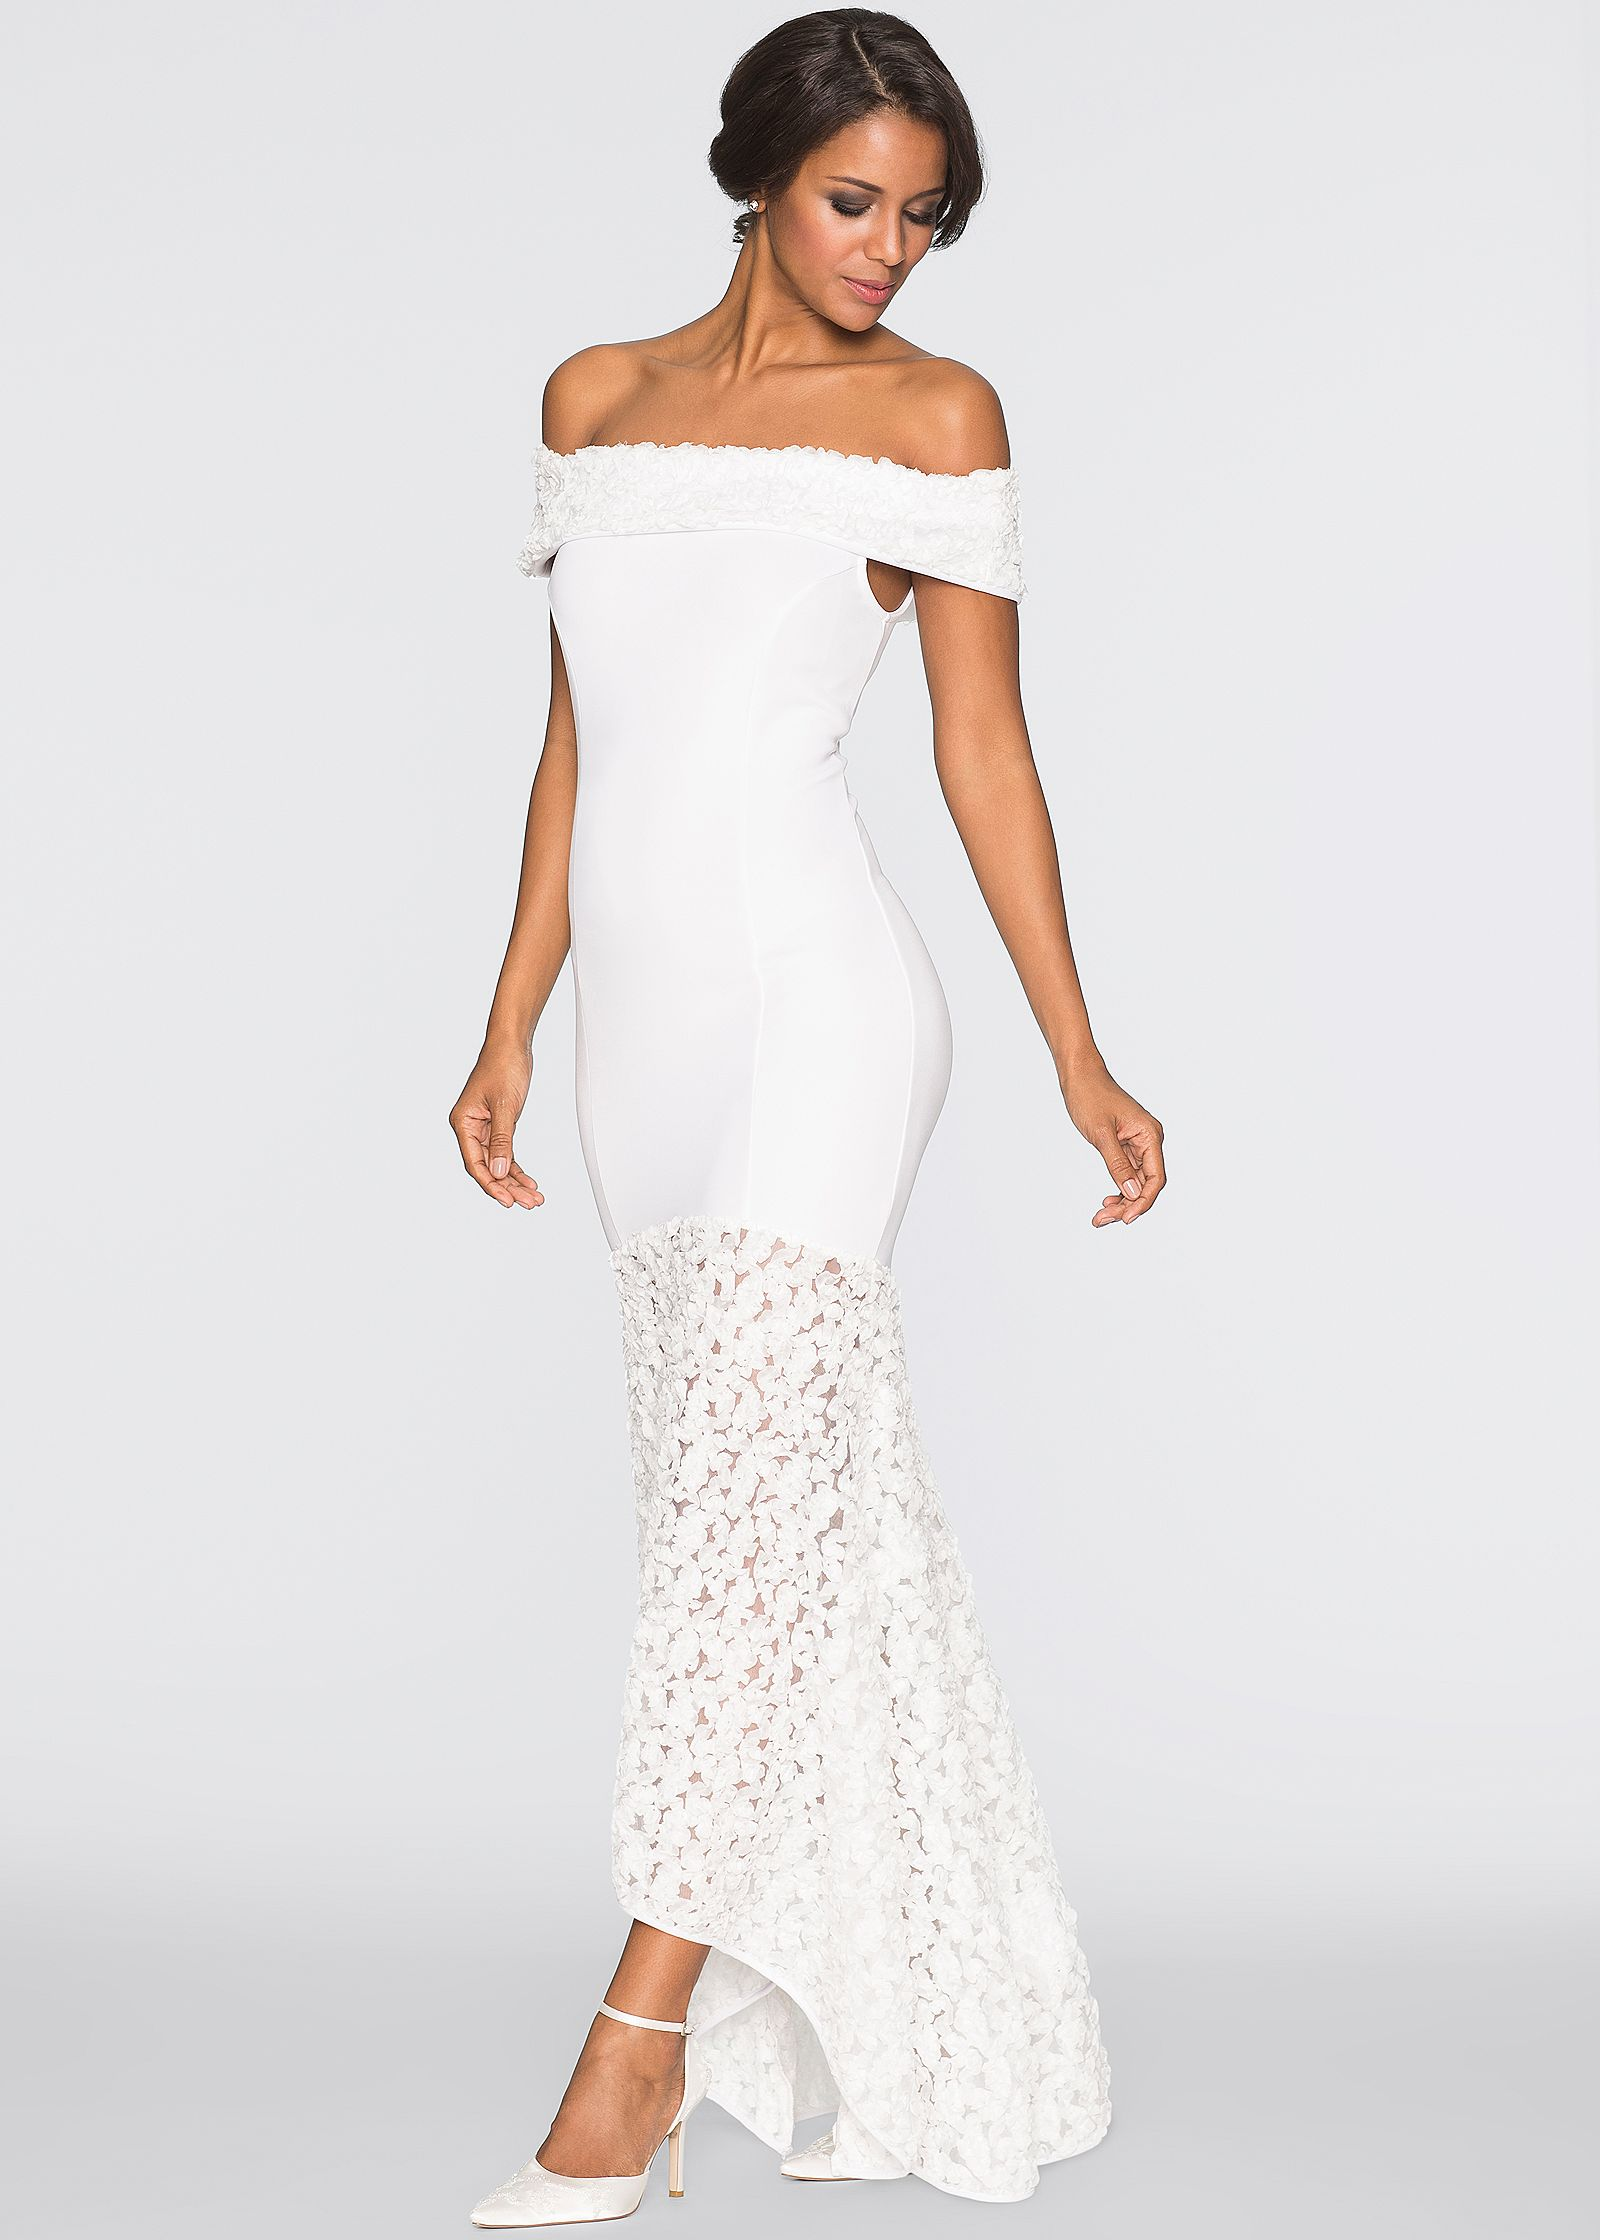 Sexy Dresses For Wedding 99 Epic STRAPLESS WEDDING DRESS